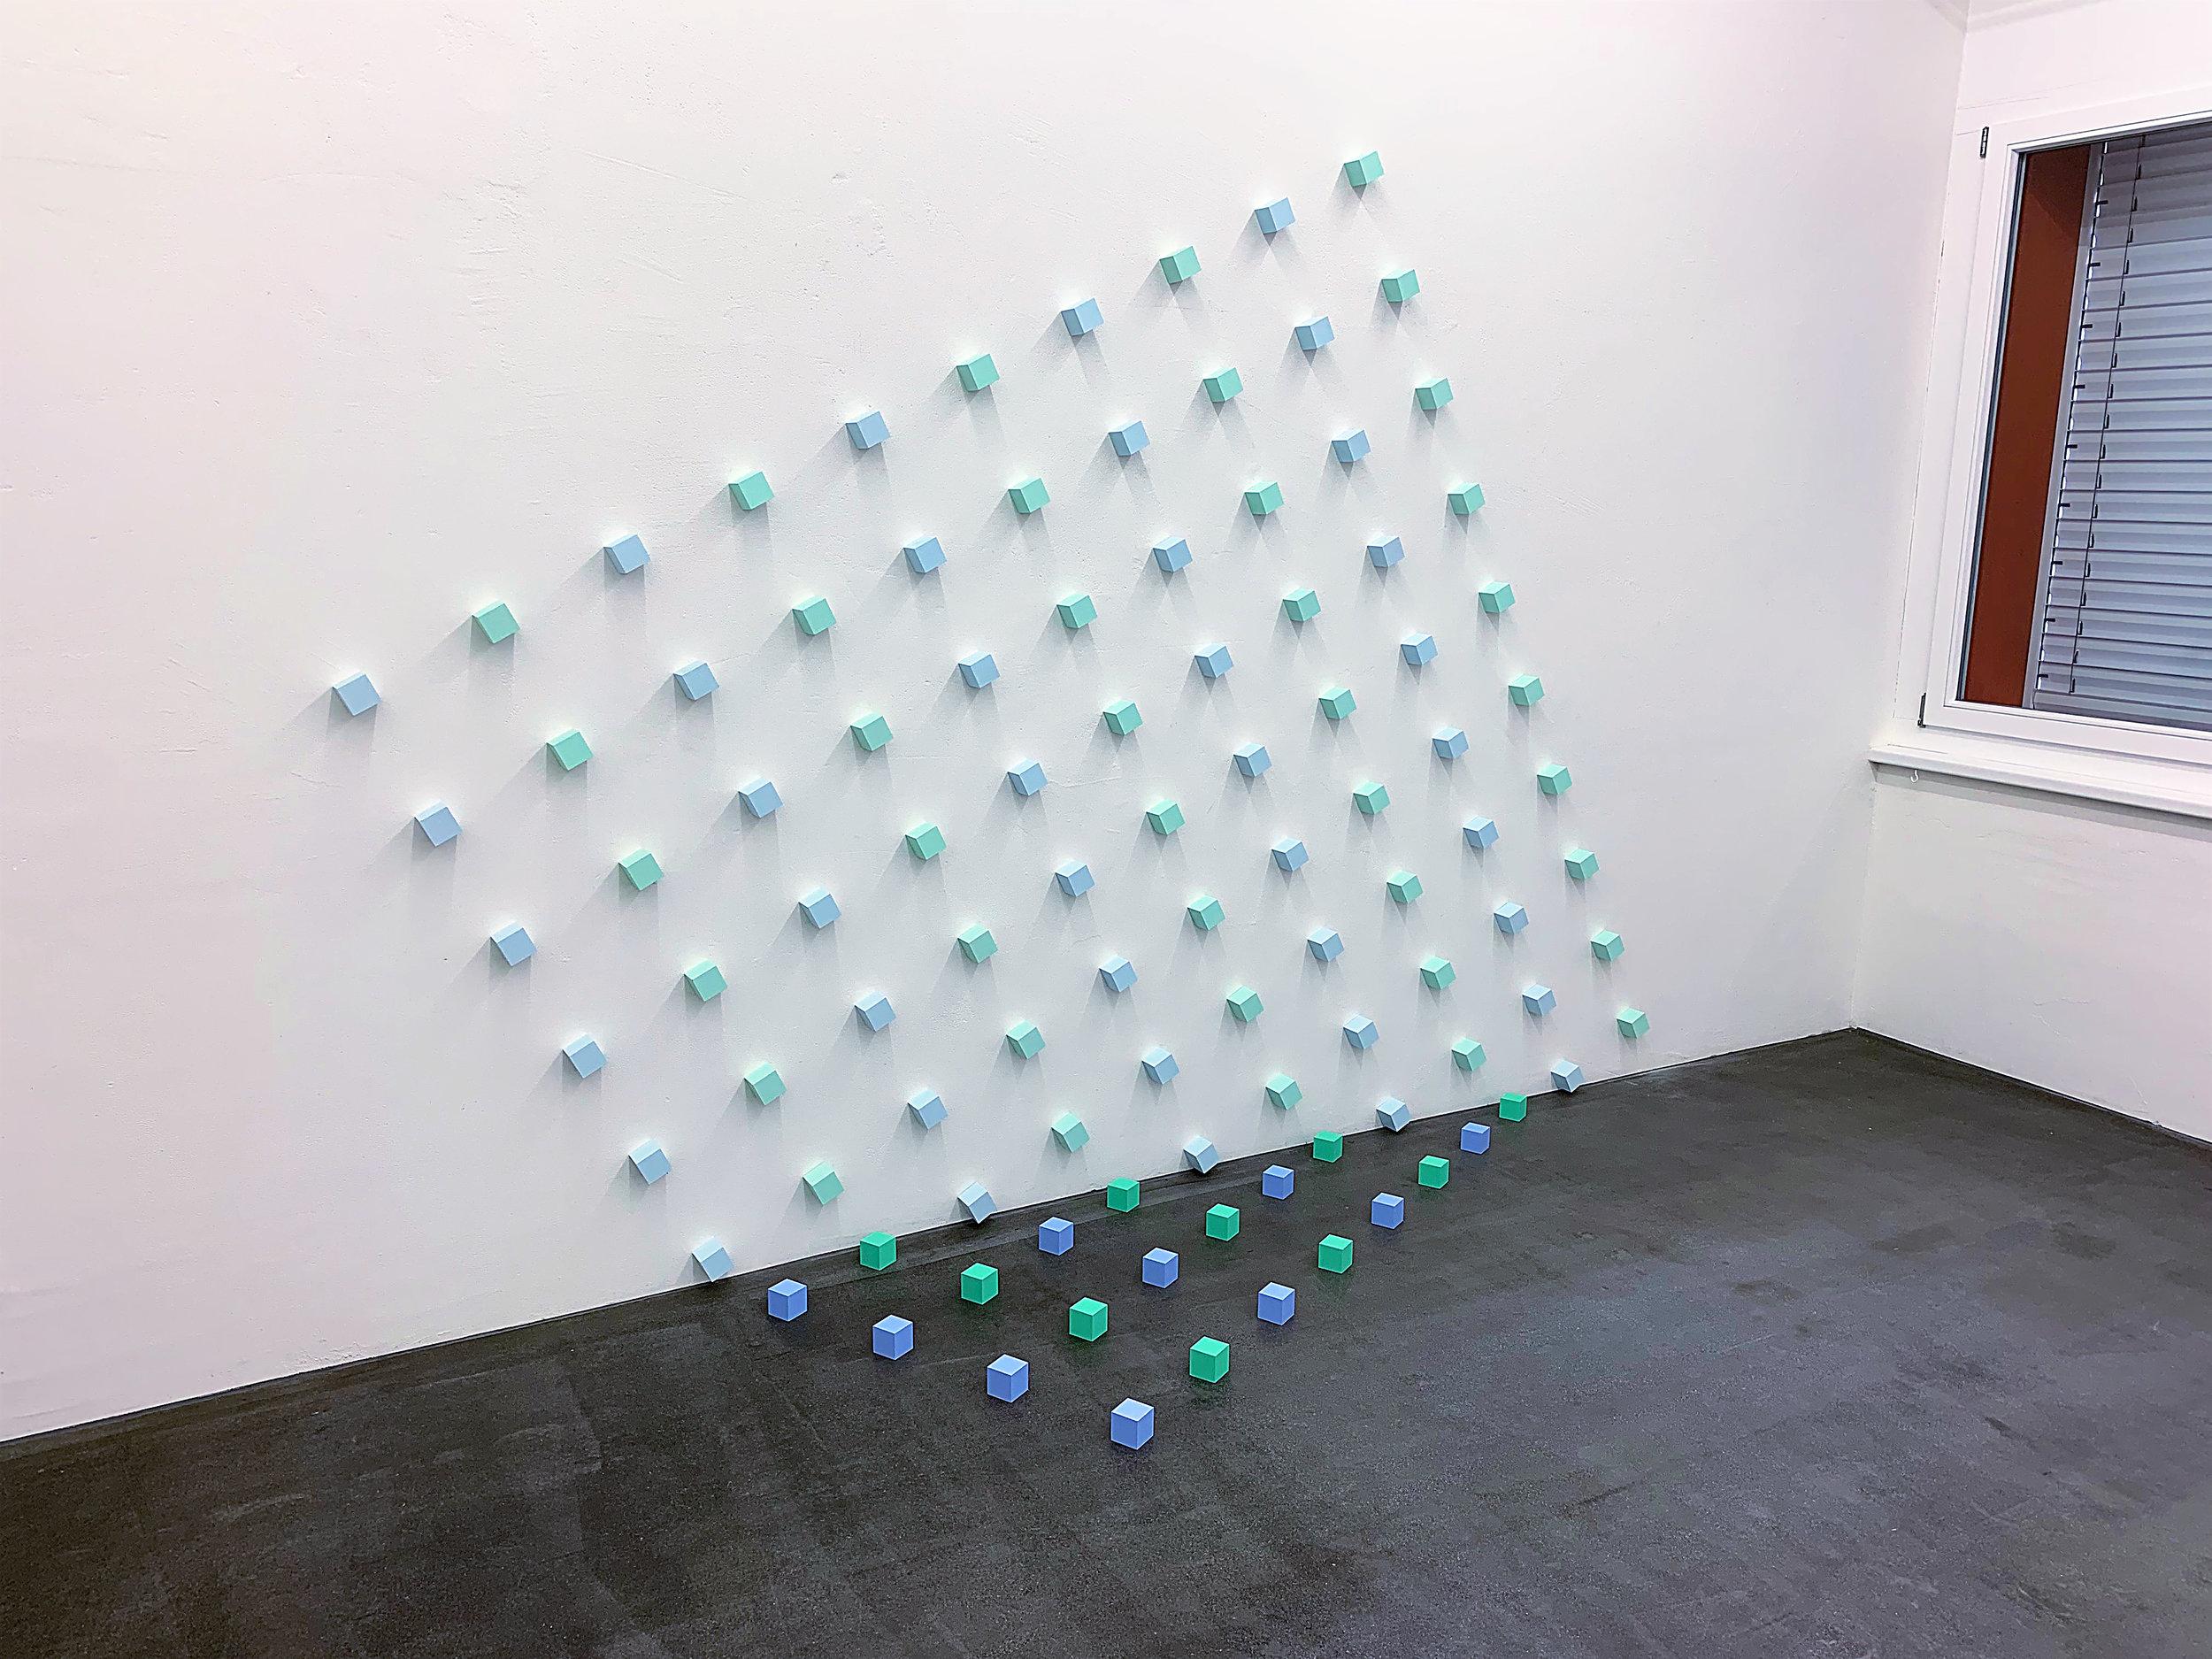 "Boden-Wand-Installation "" Quadrat 1"" (mit Kuben, 5 x 5 x 5 cm) 1991 - 2019, MDF, Acryl, Stahlnägel H: 219,15 cm, B: 301 cm, T: 81,9 cm"